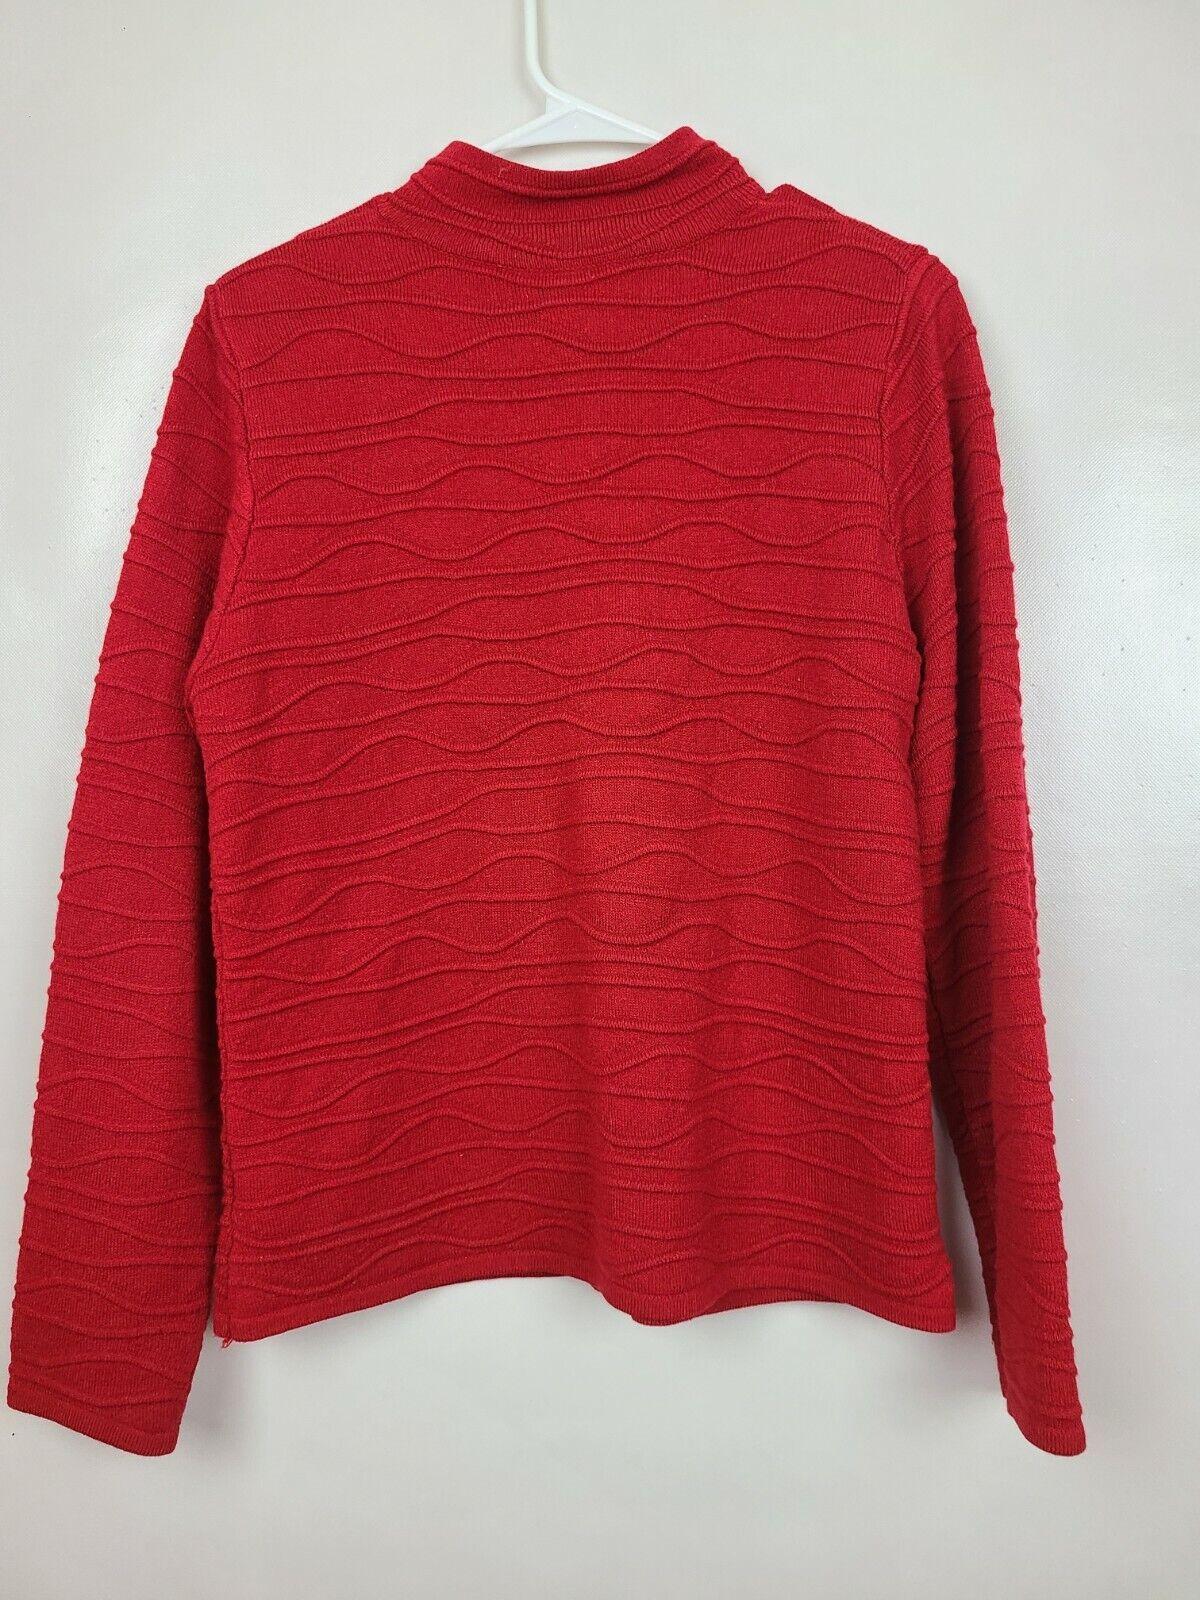 Coldwater Creek Womens Cardigan Sweater Medium Re… - image 3